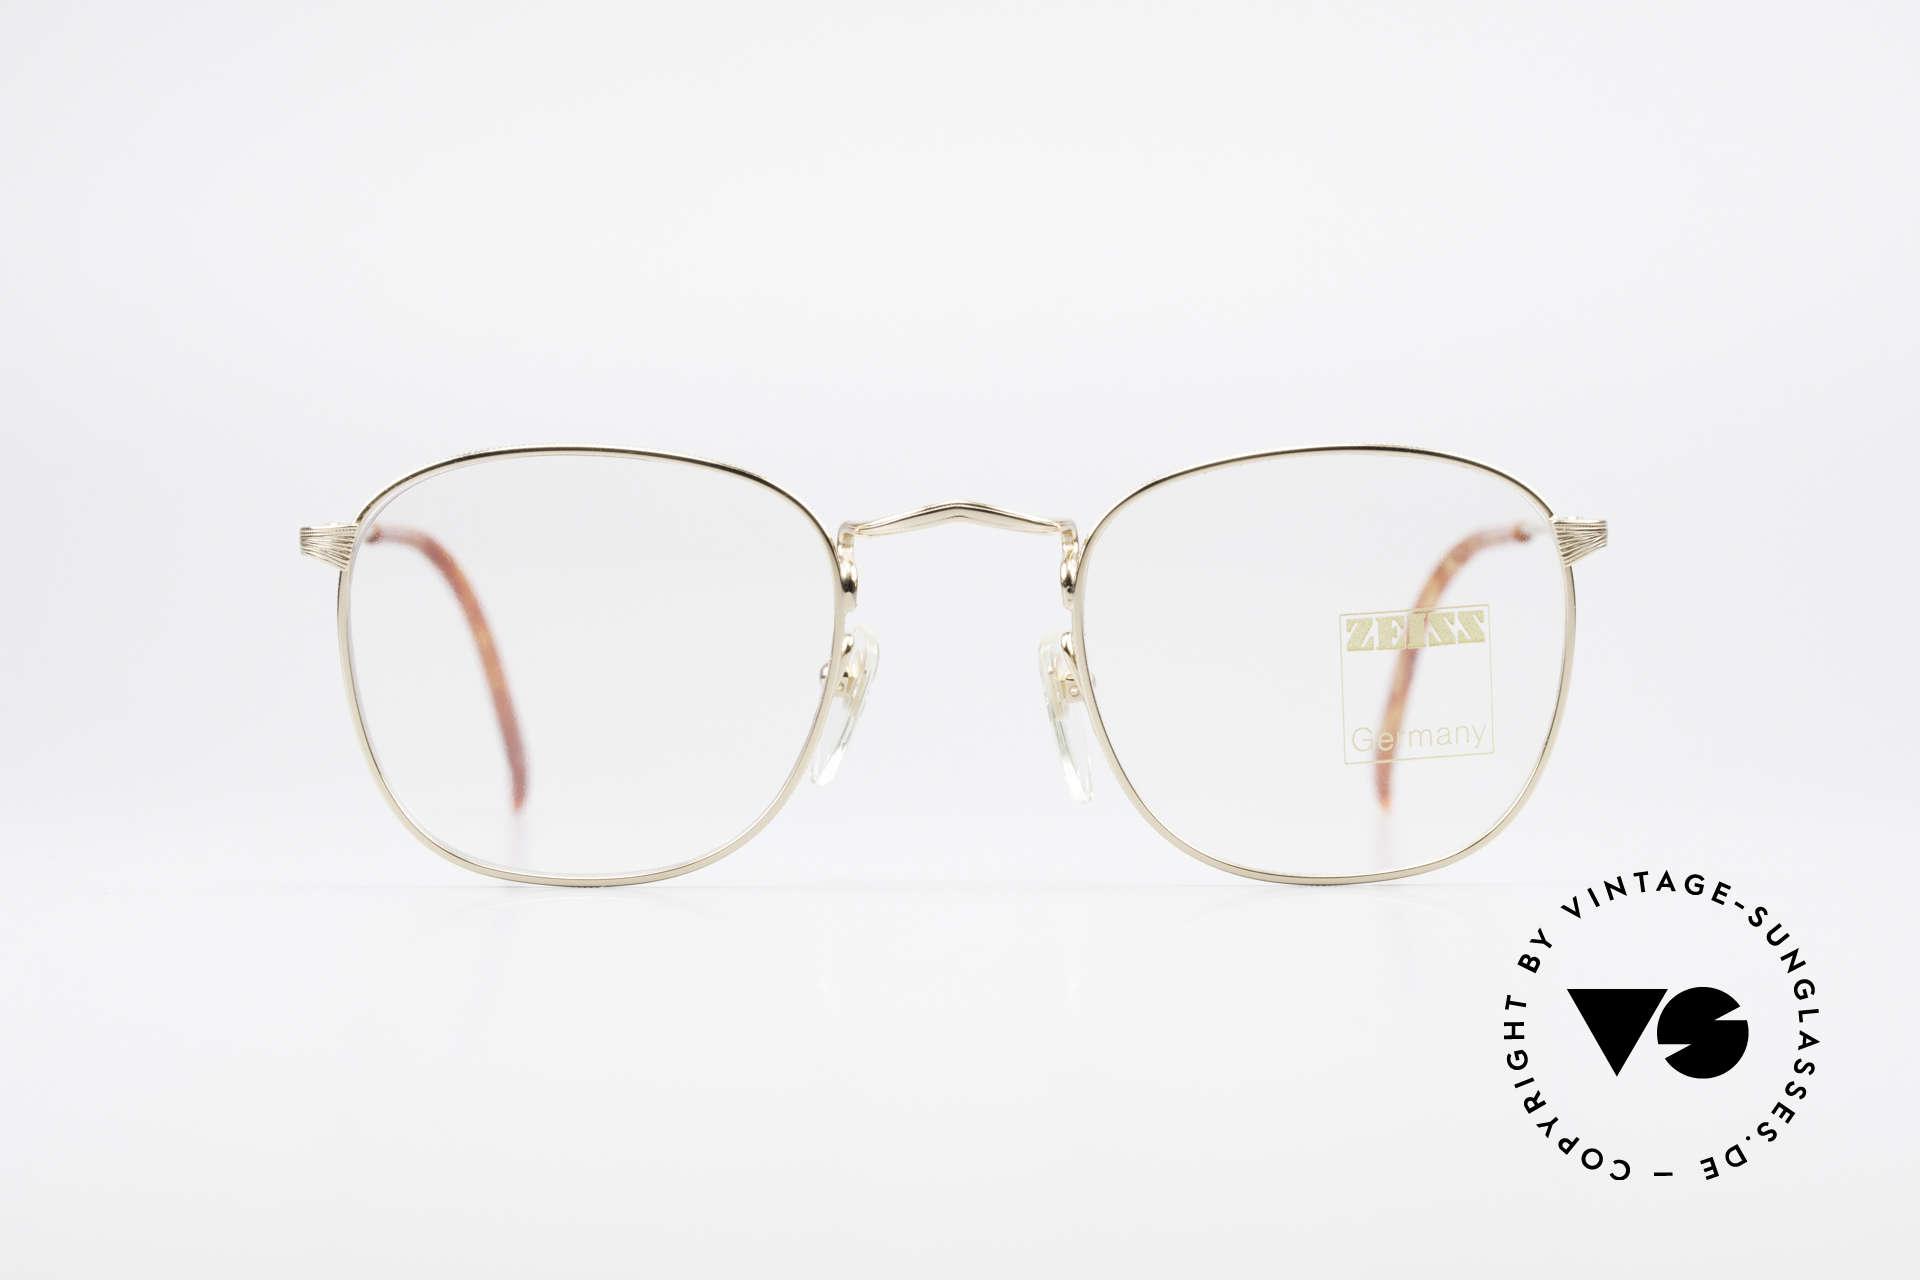 Zeiss 5988 Old Vintage 90's Glasses Men, outstanding craftsmanship - frame 'made in Germany', Made for Men